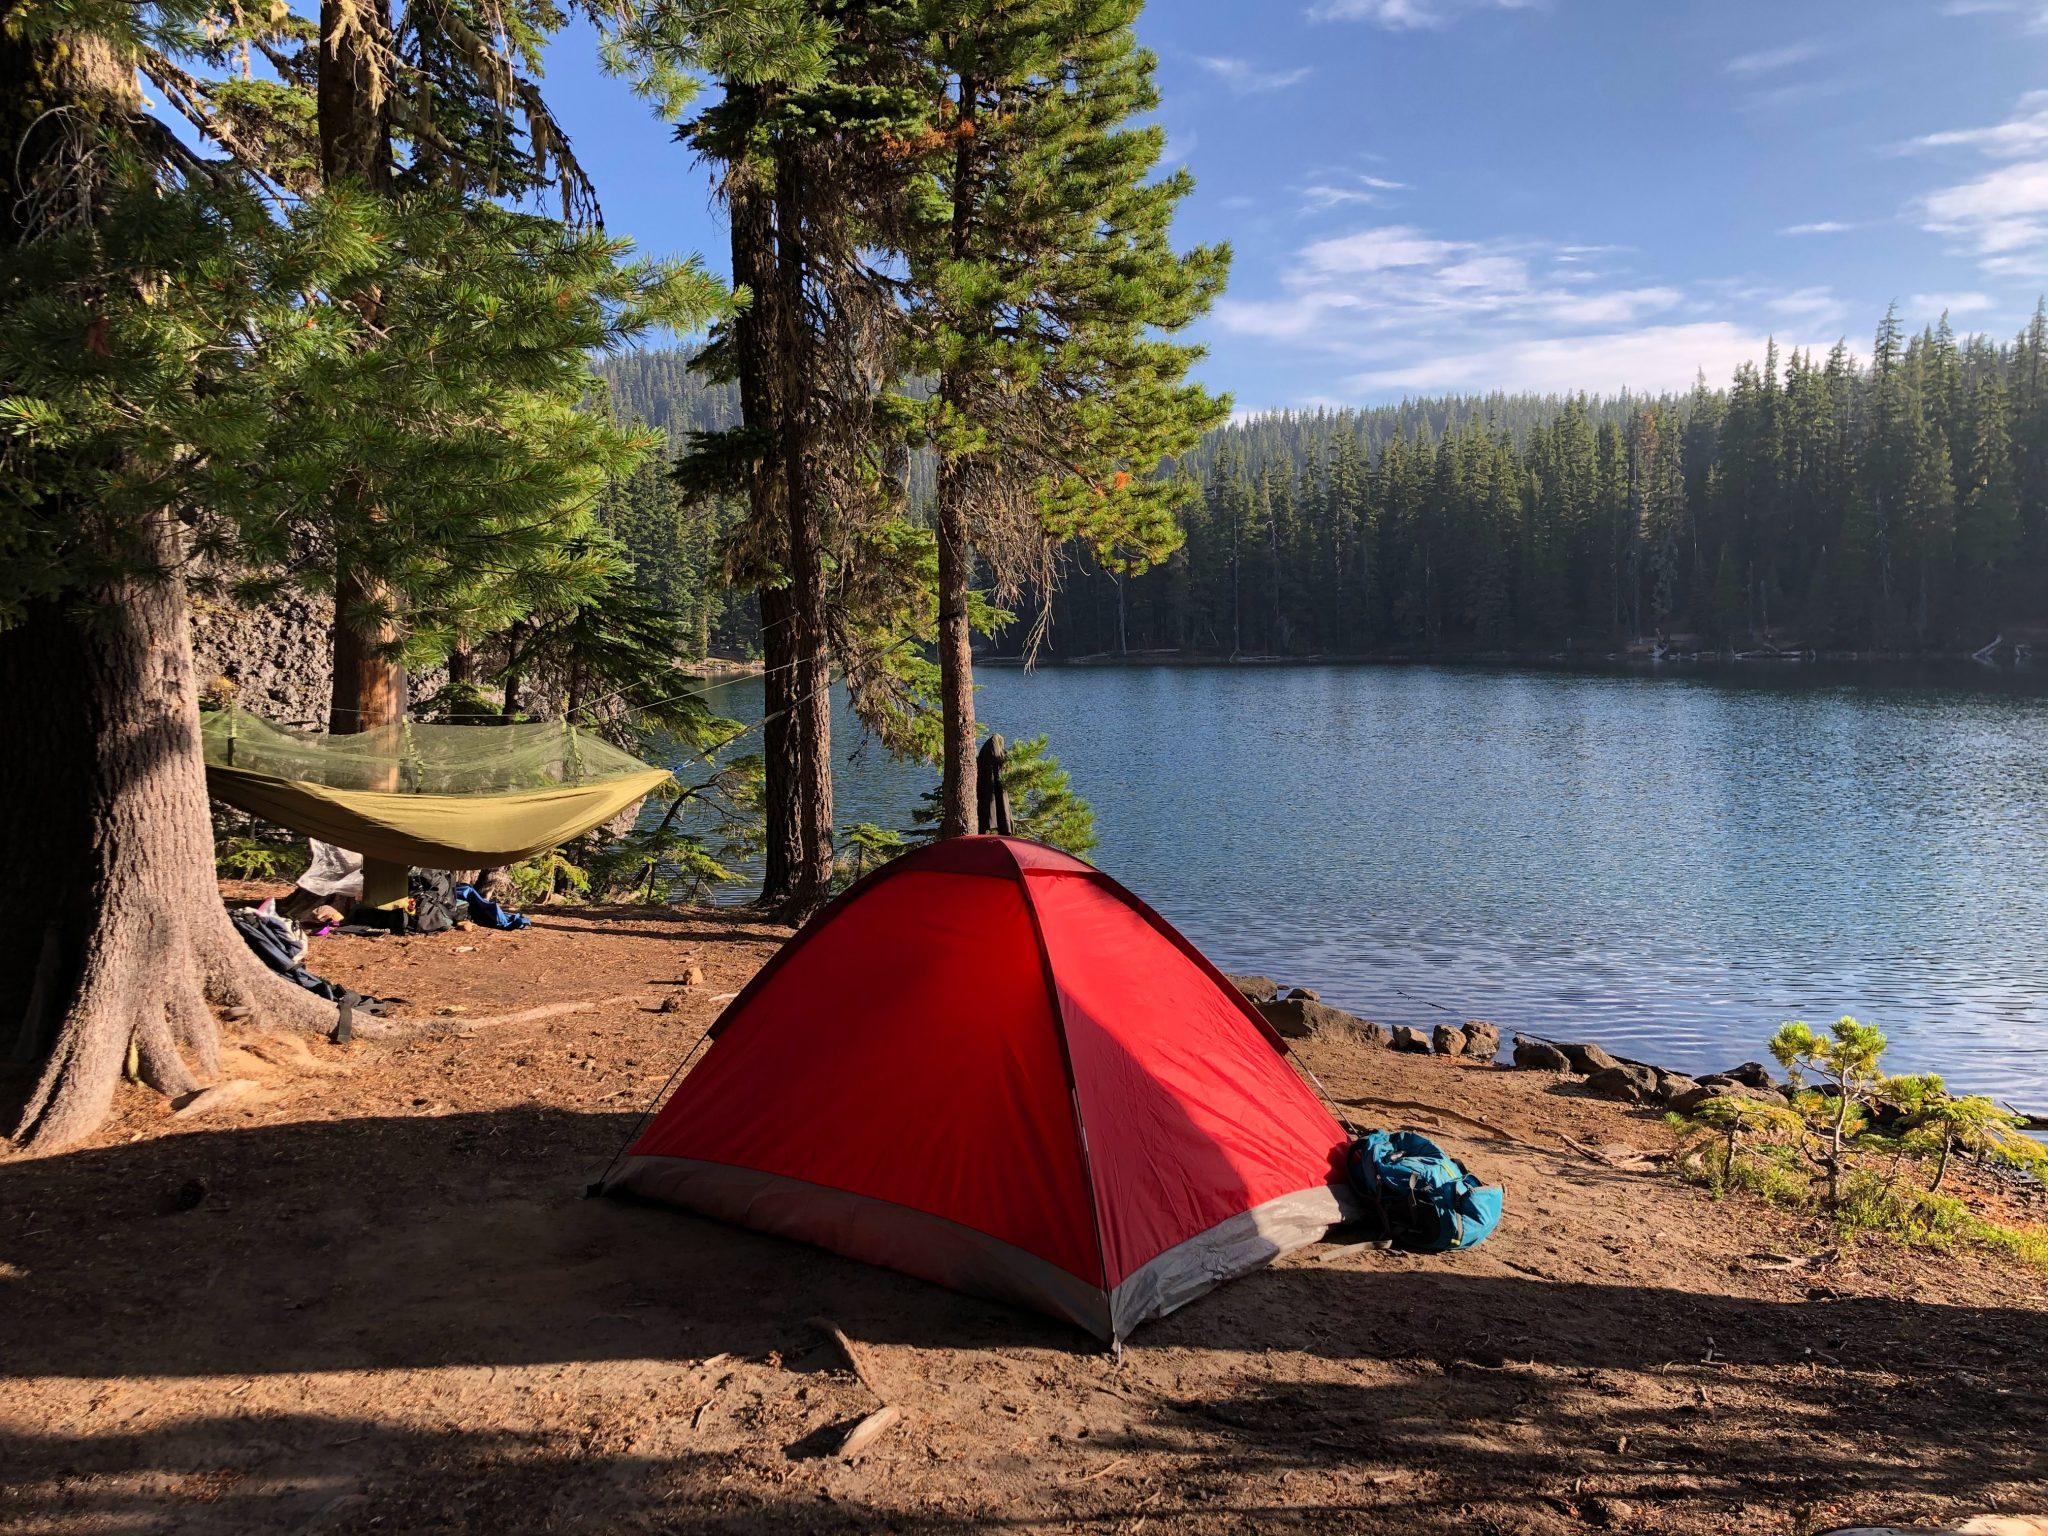 Can't Find a Decent Campsite?